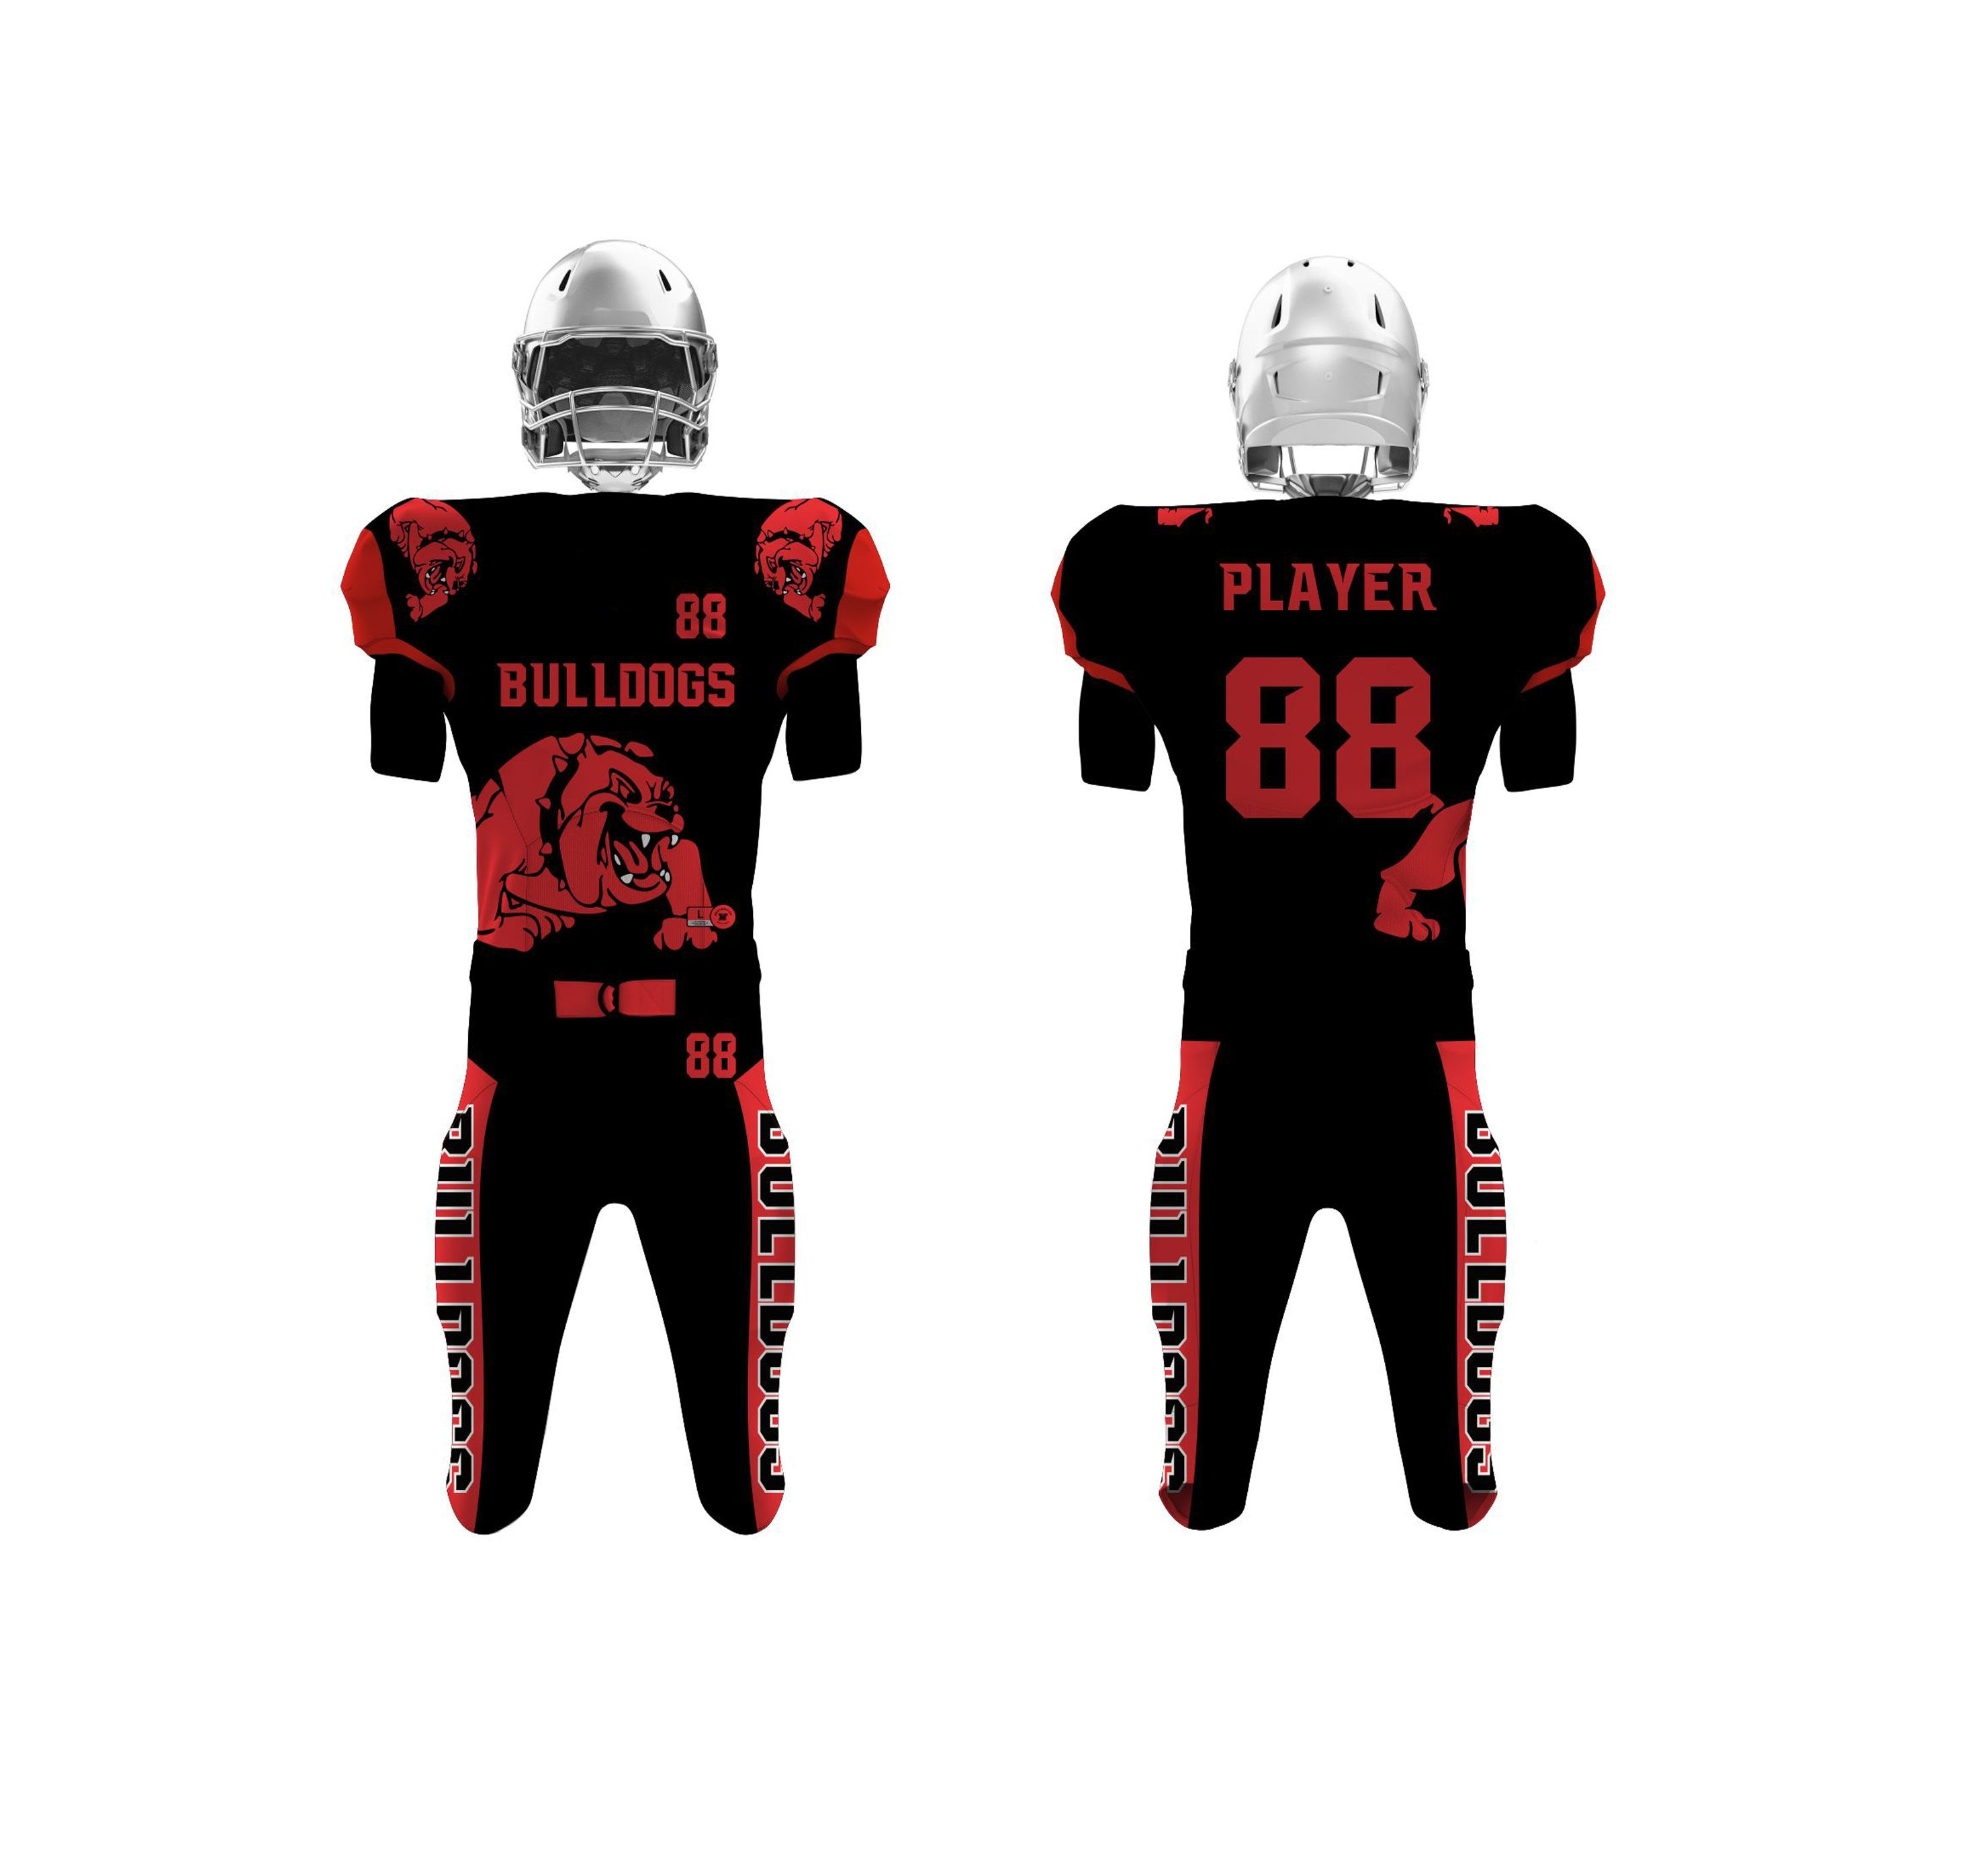 American Football Uniforms Sports Garments Team Wear Team Apparel